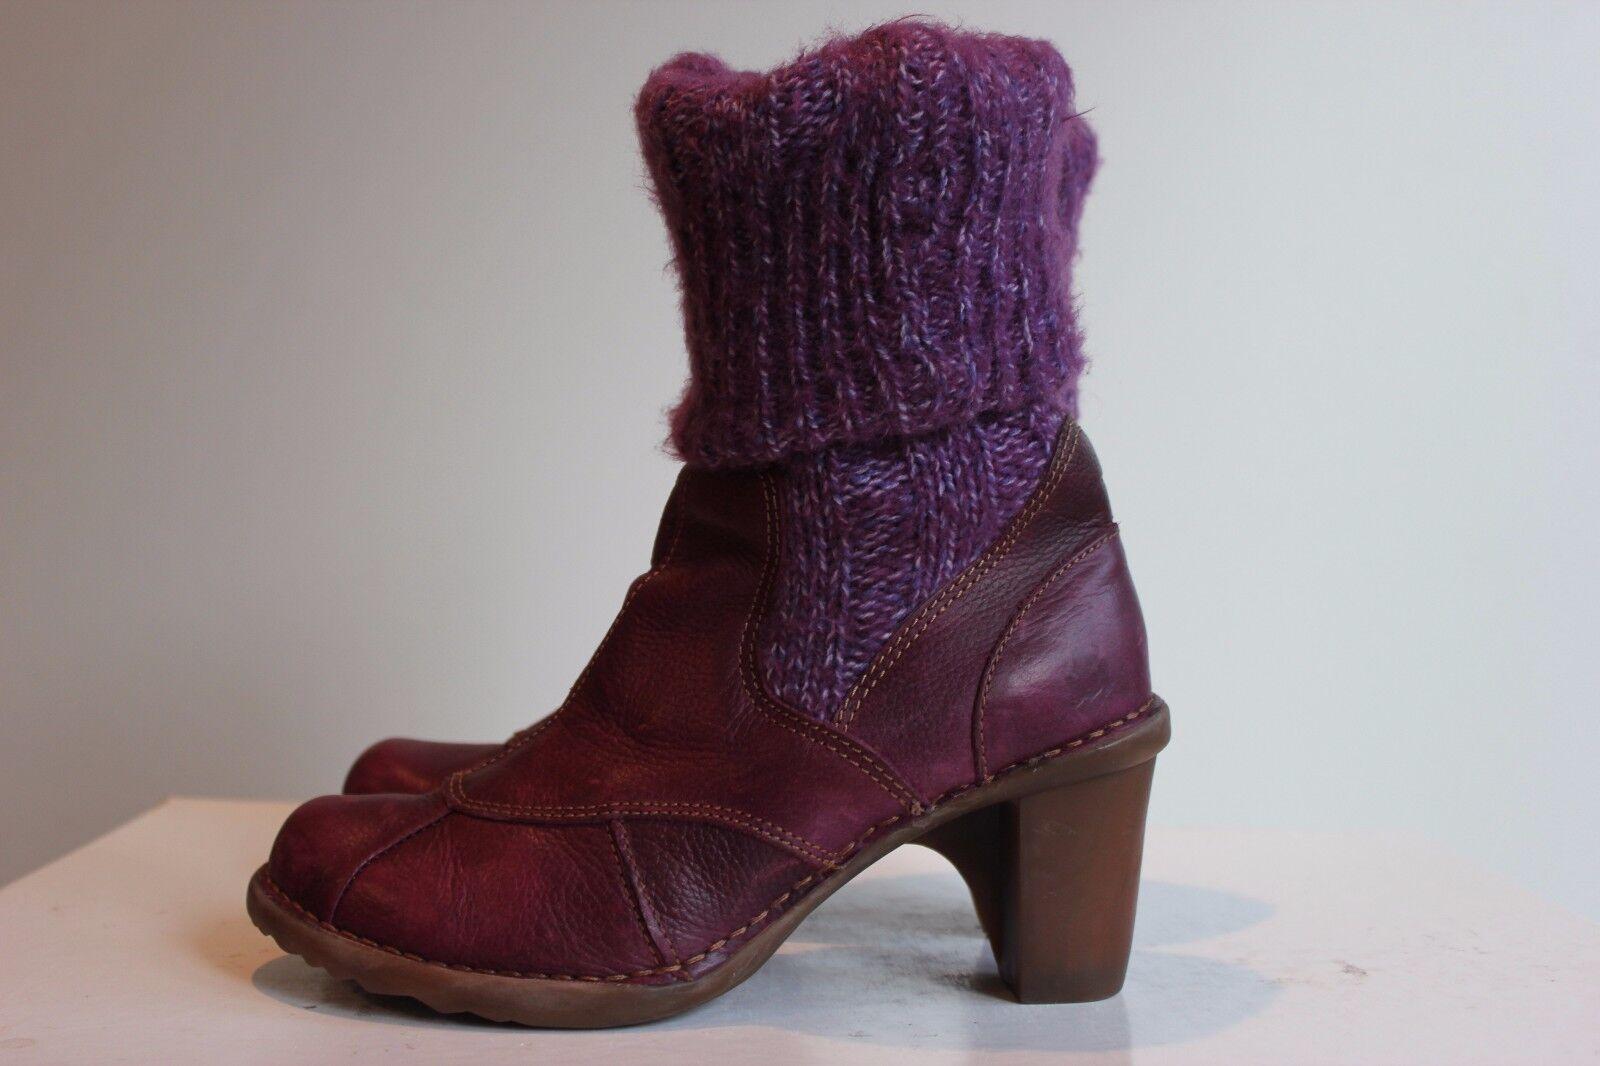 EL NATURALISTA Superschöner purple Echtleder Stiefeletten, Gr. 38, Top Zustand